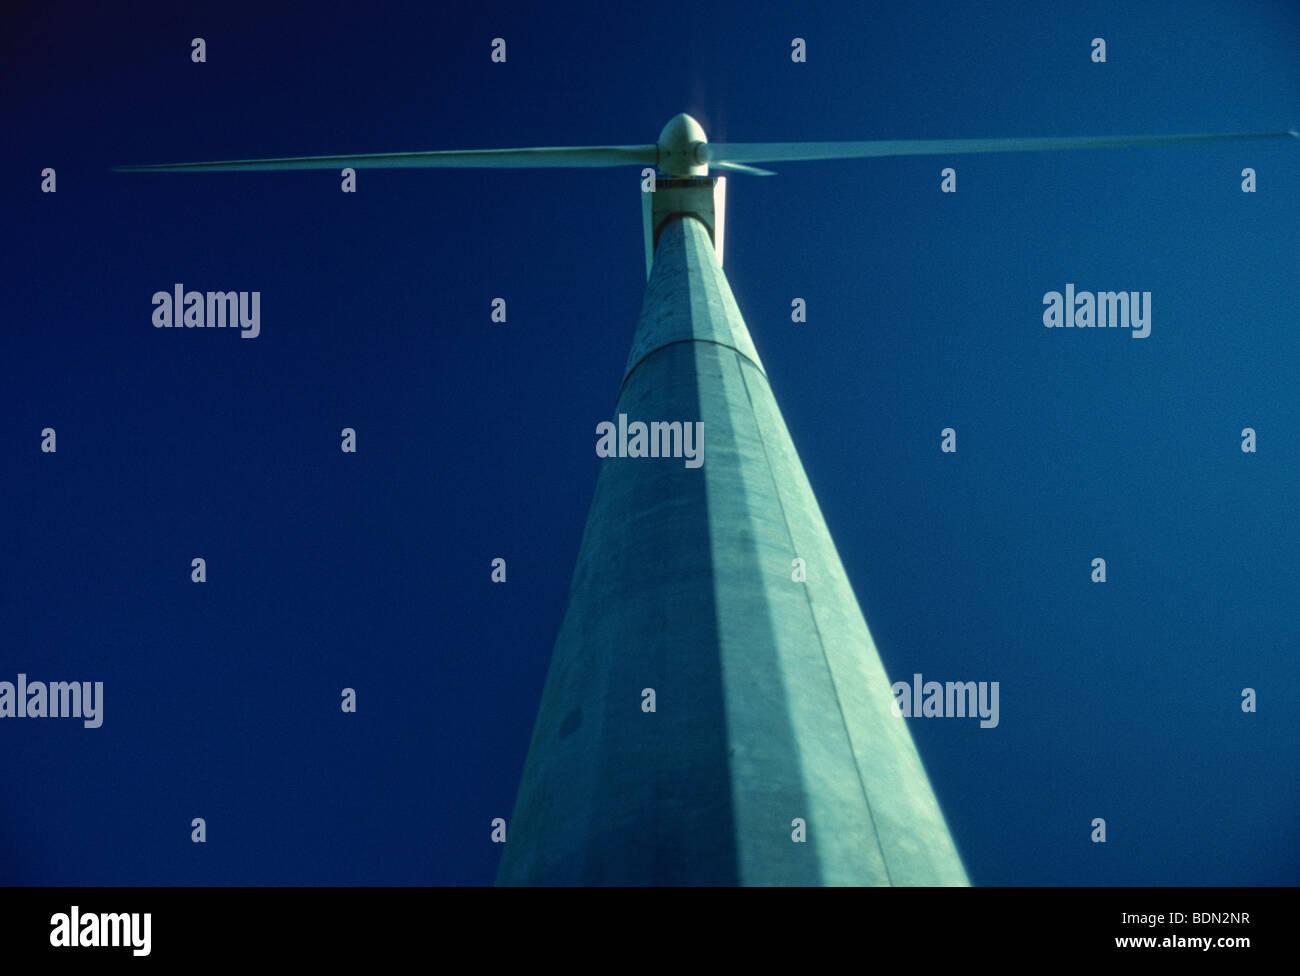 Washington State windmills - Stock Image